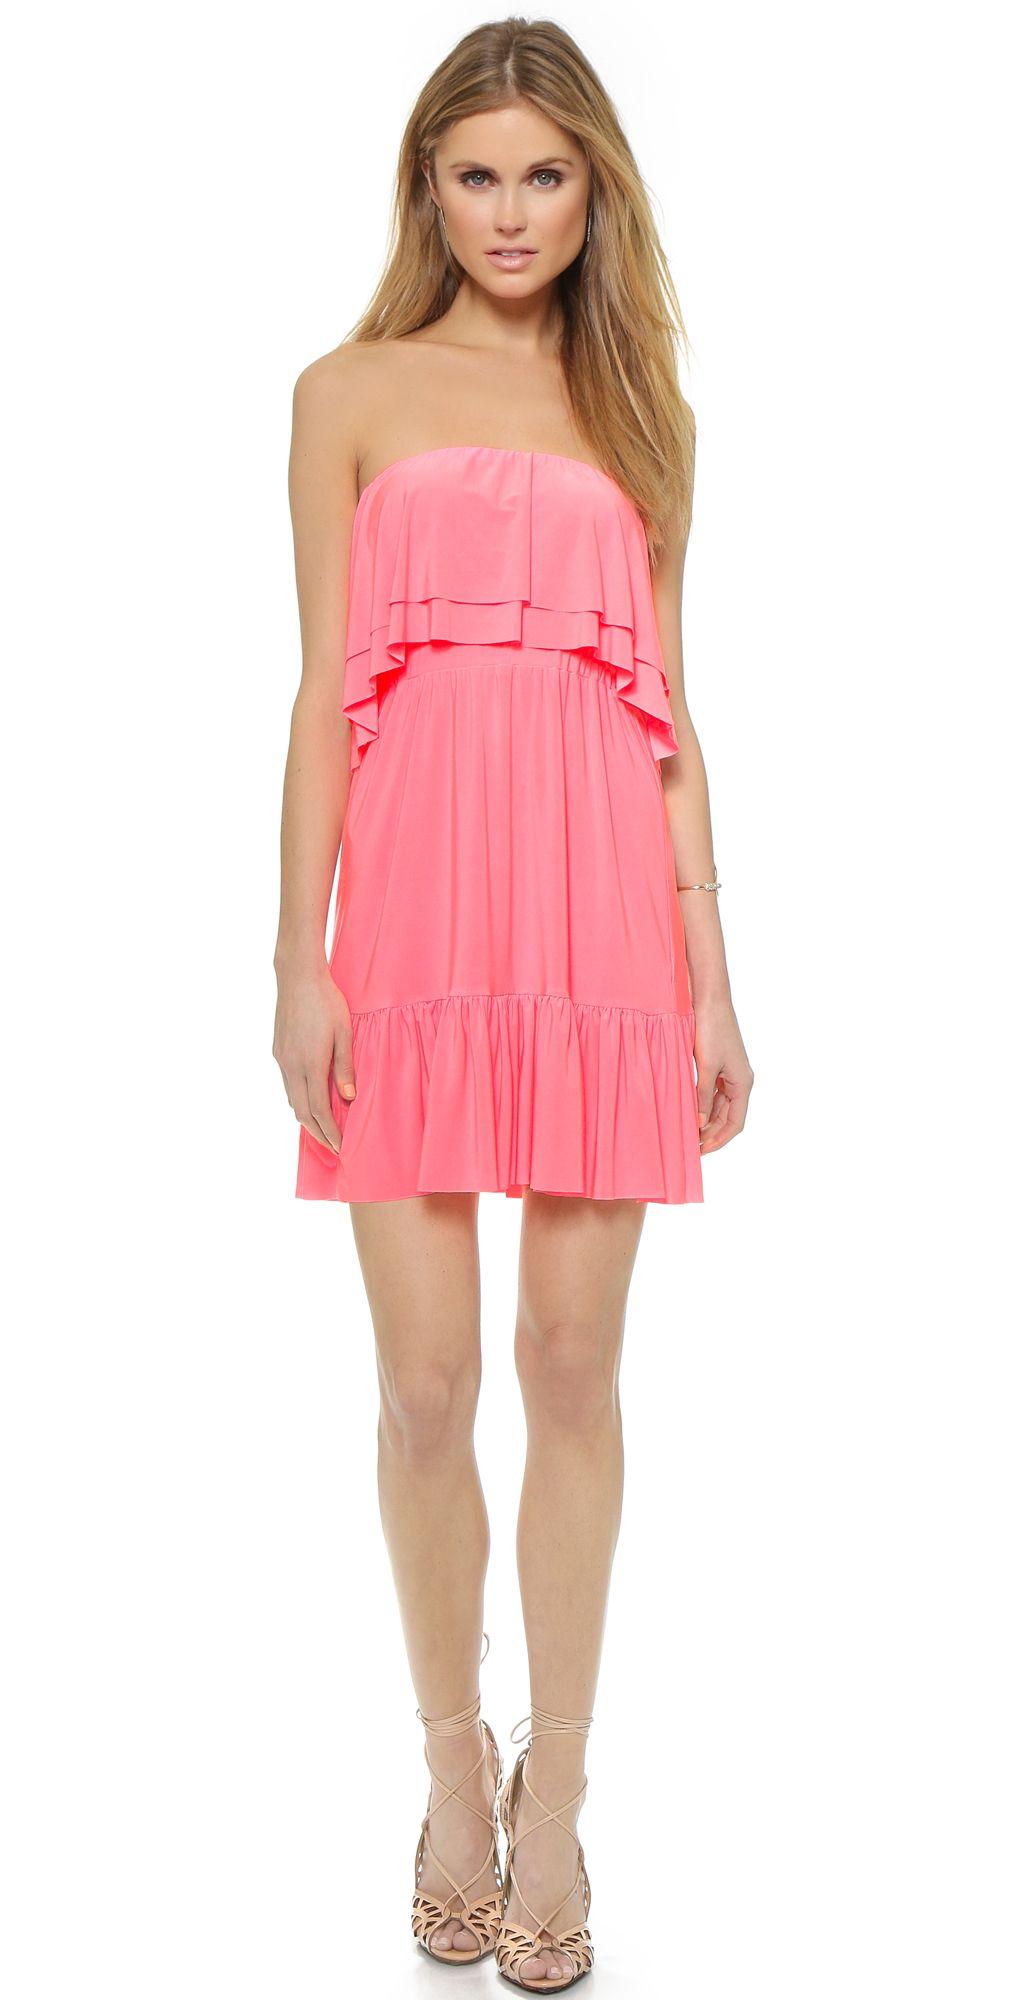 Tbags Los Angeles Ruffle Strapless Dress Shopbop Save 25 Use Code Bigevent15 Strapless Ruffle Dress Dresses Strapless Dress [ 2000 x 1016 Pixel ]